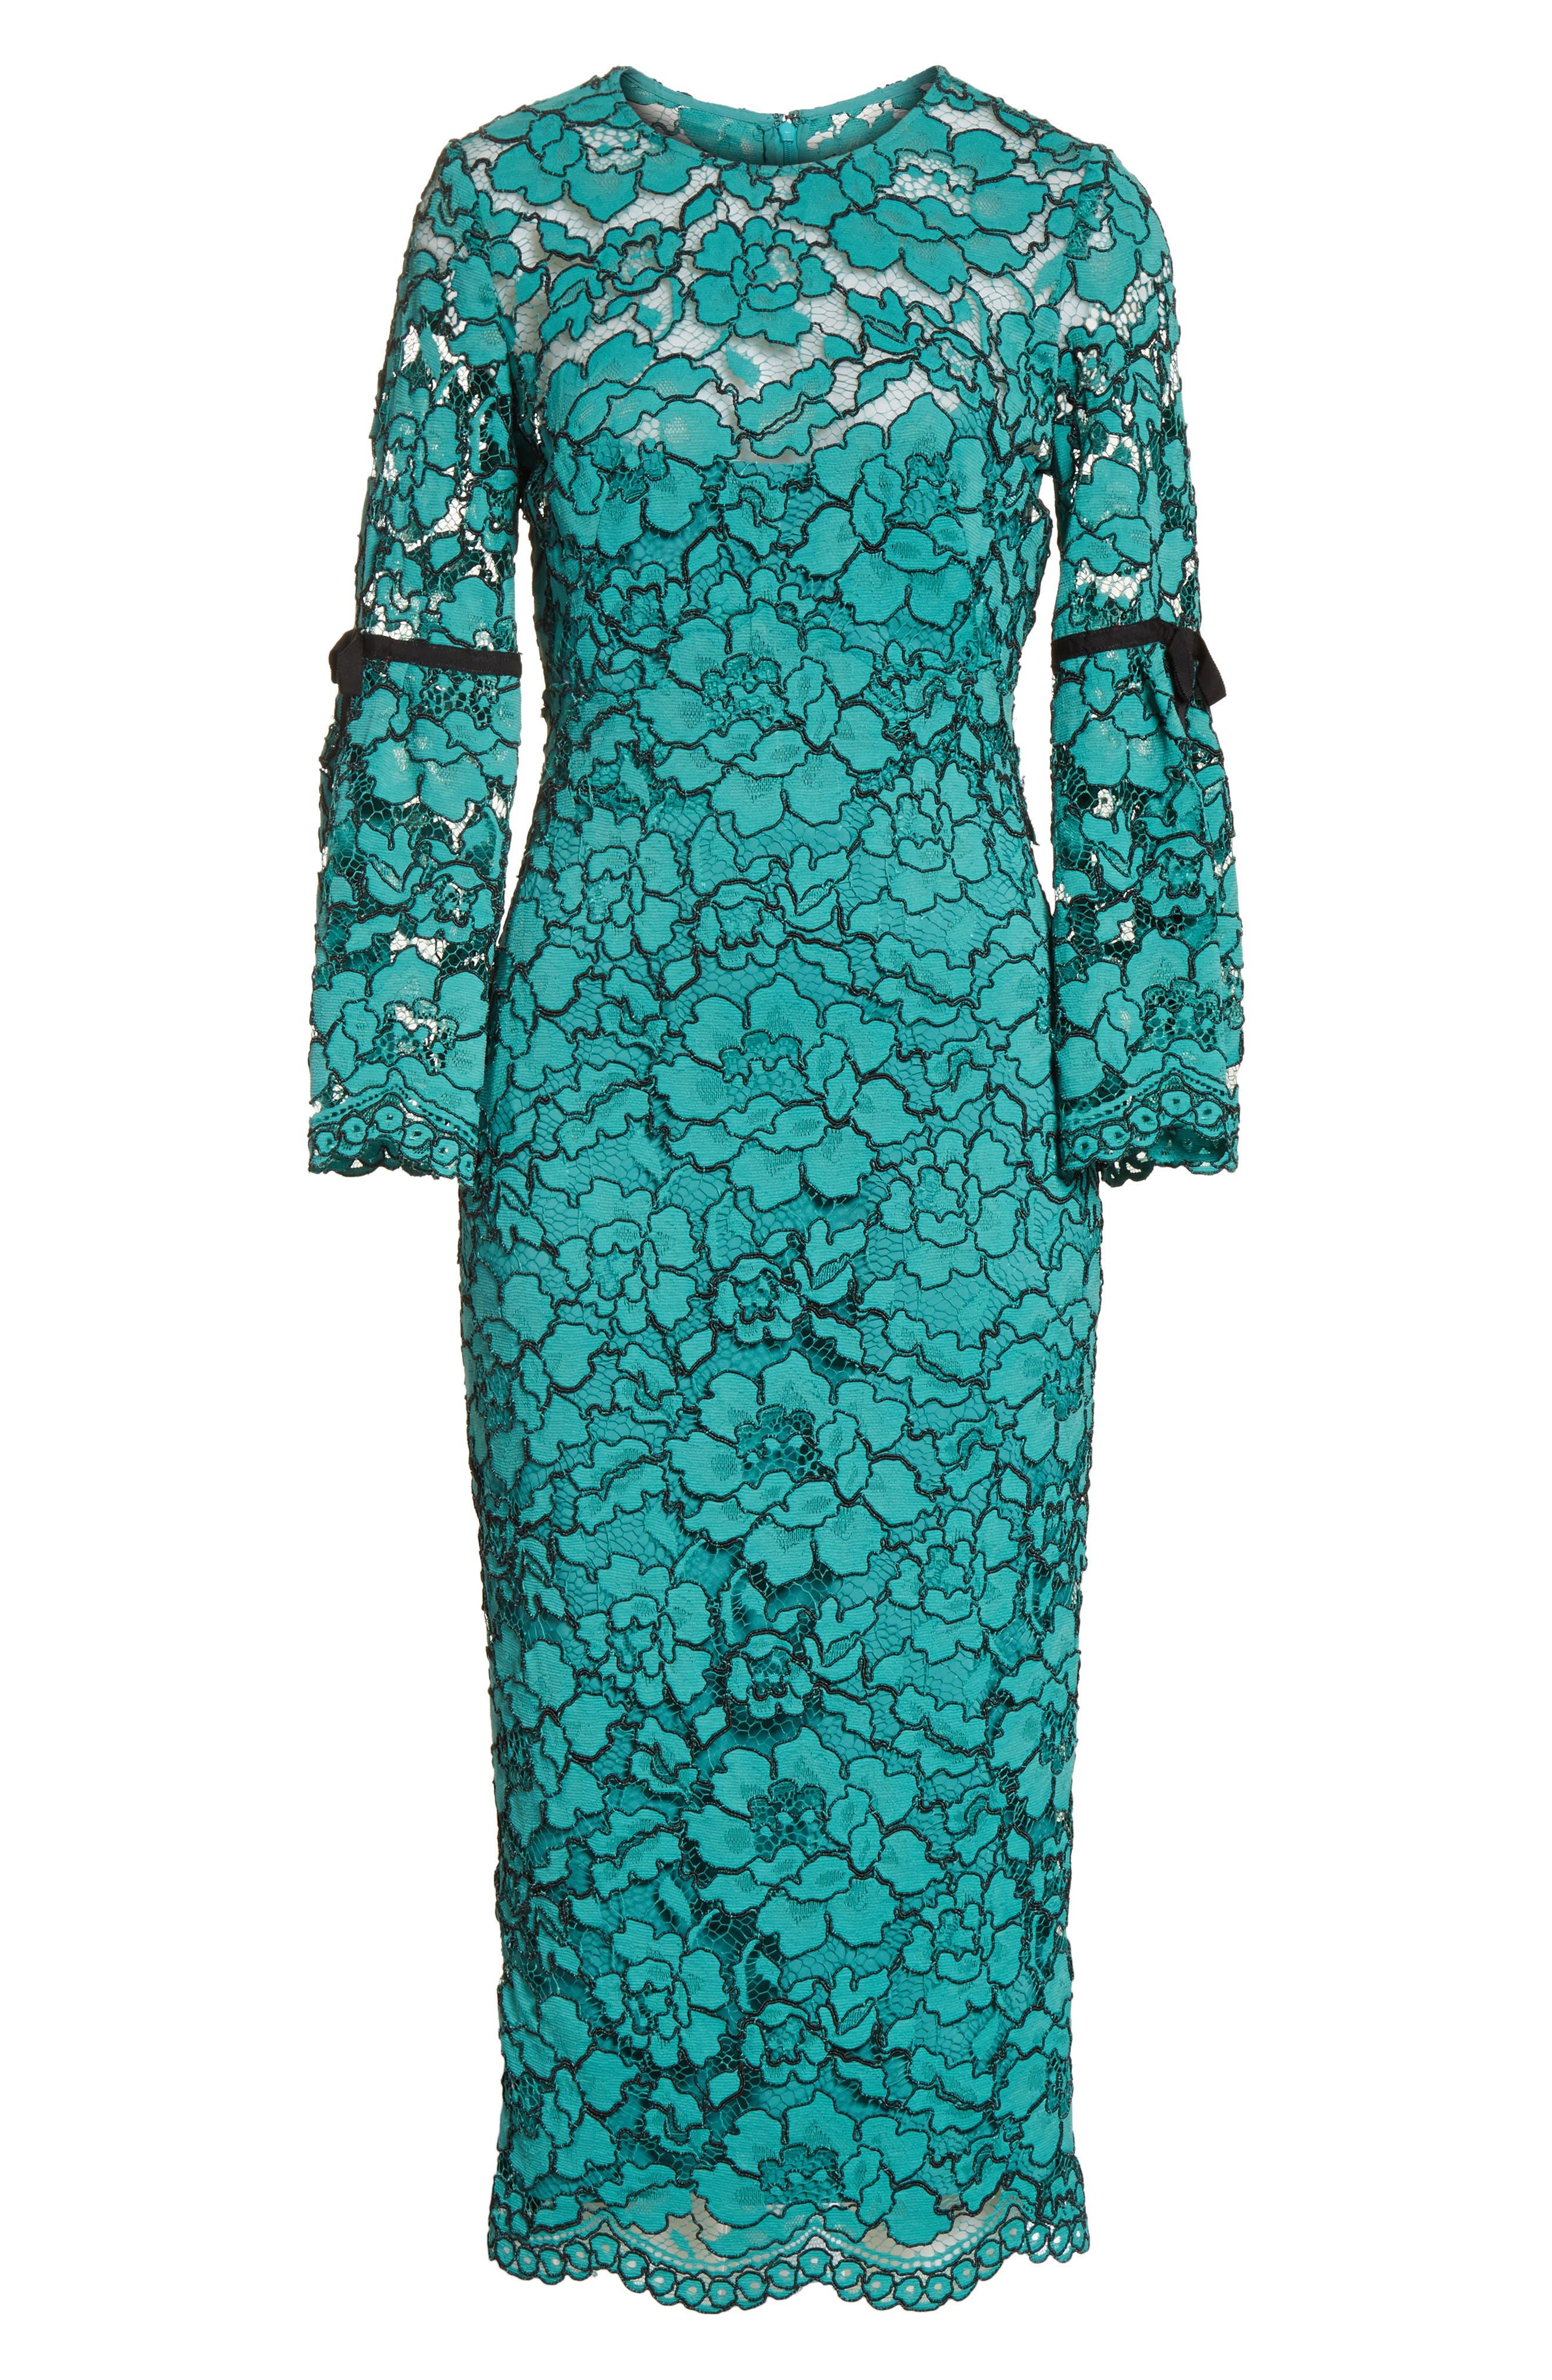 Lace Bell Sleeve Sheath Dress,                             Alternate thumbnail 8, color,                             Jade